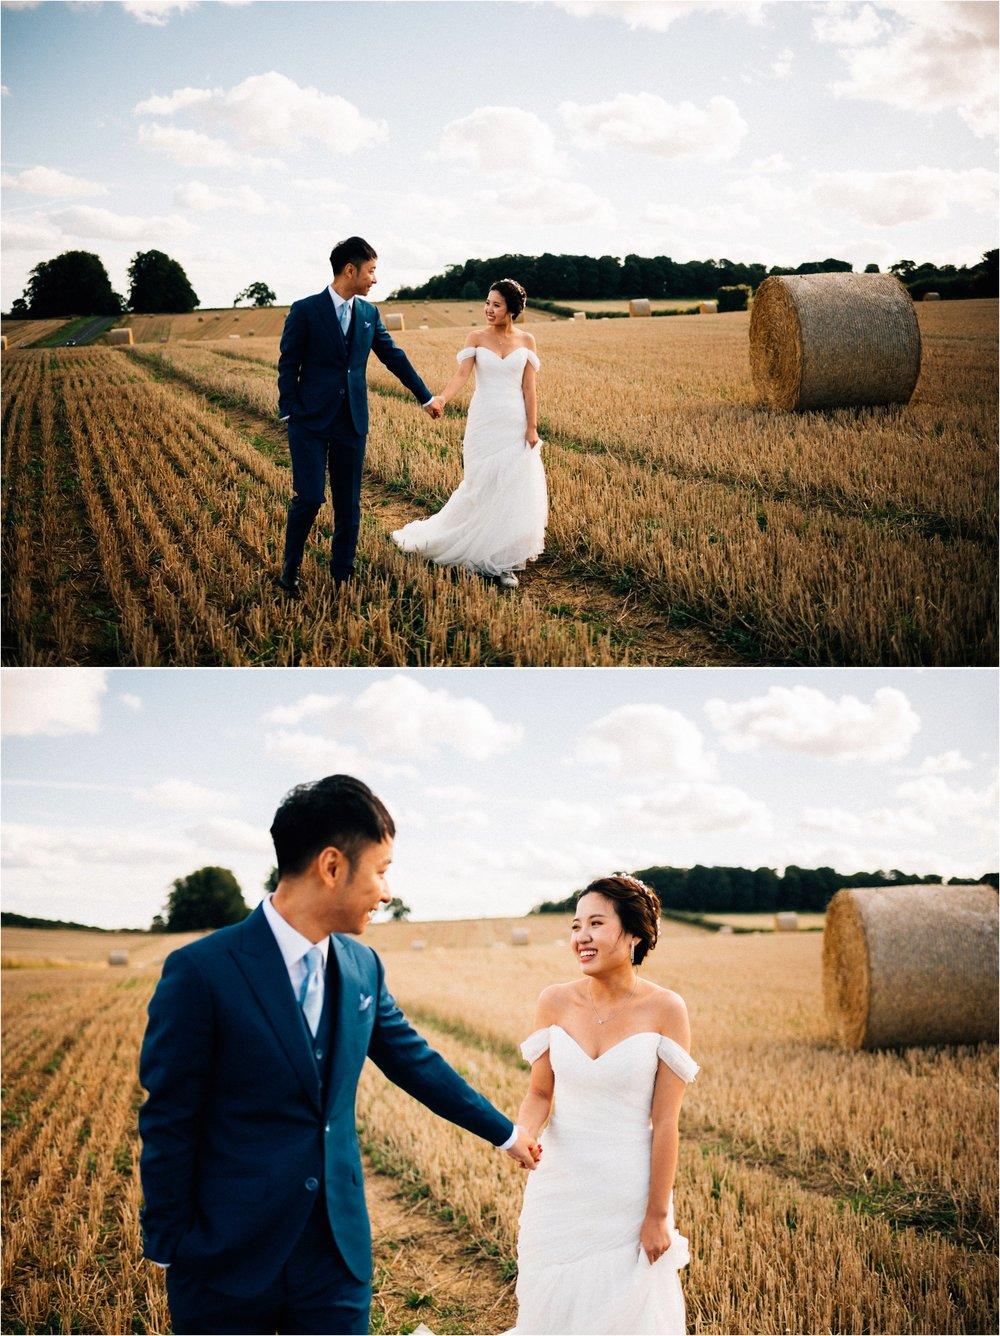 York city elopement wedding photographer_0200.jpg